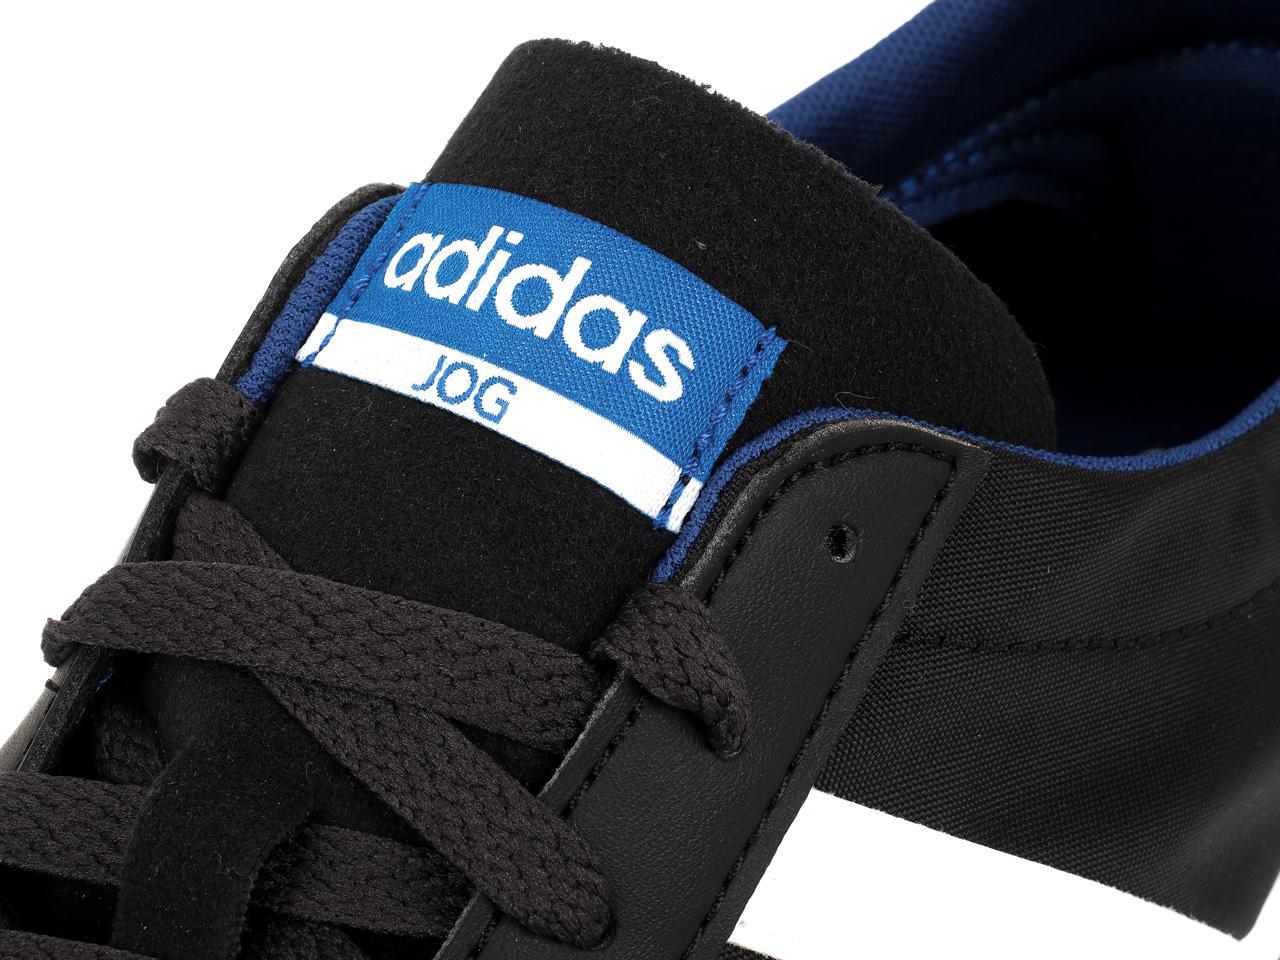 Chaussures-mode-ville-Adidas-neo-Vs-jog-cblack-Noir-76450-Neuf